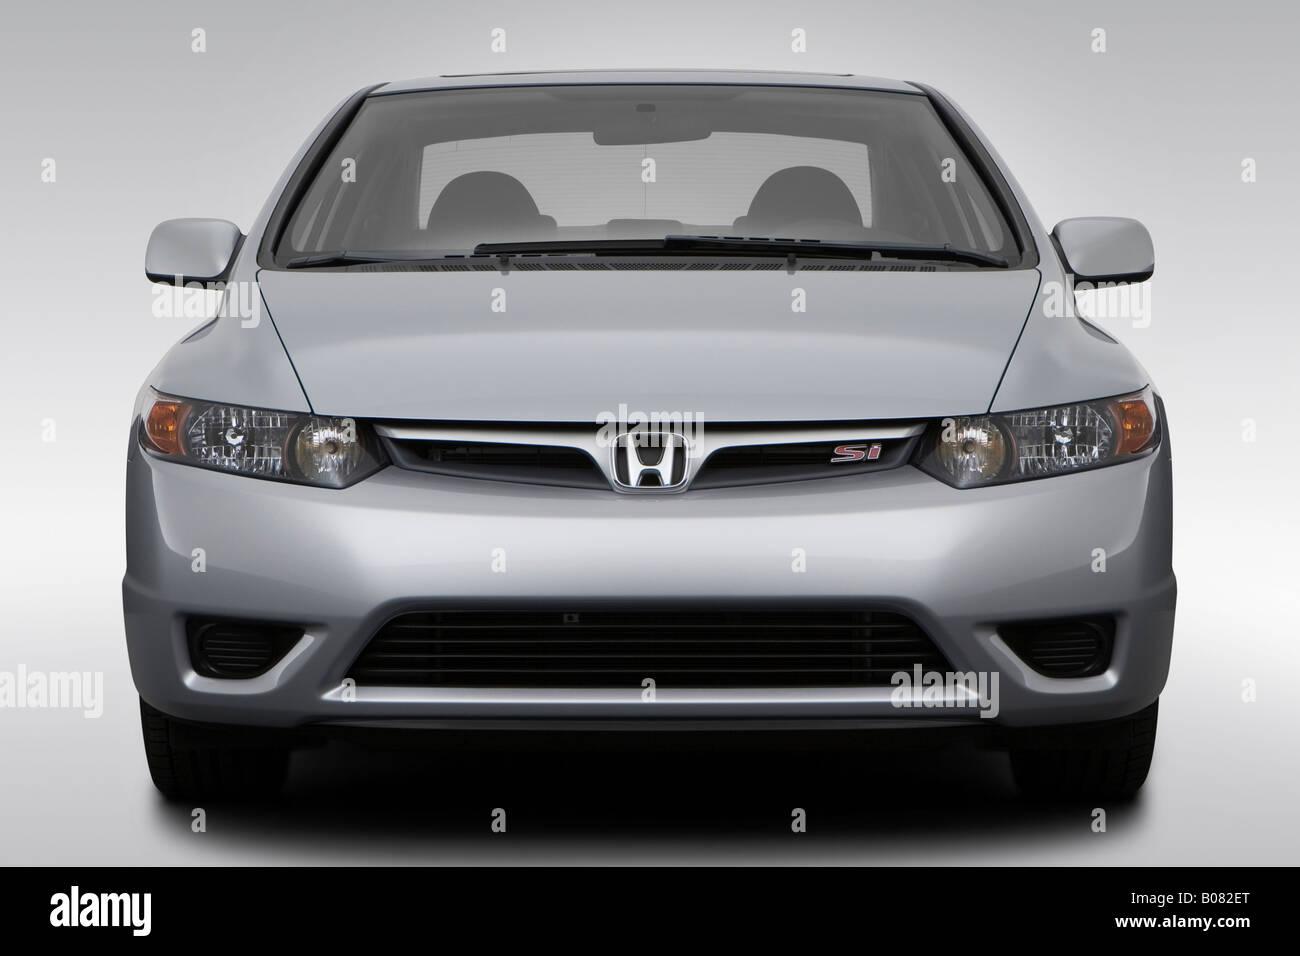 Kelebihan Honda Civic 2008 Review